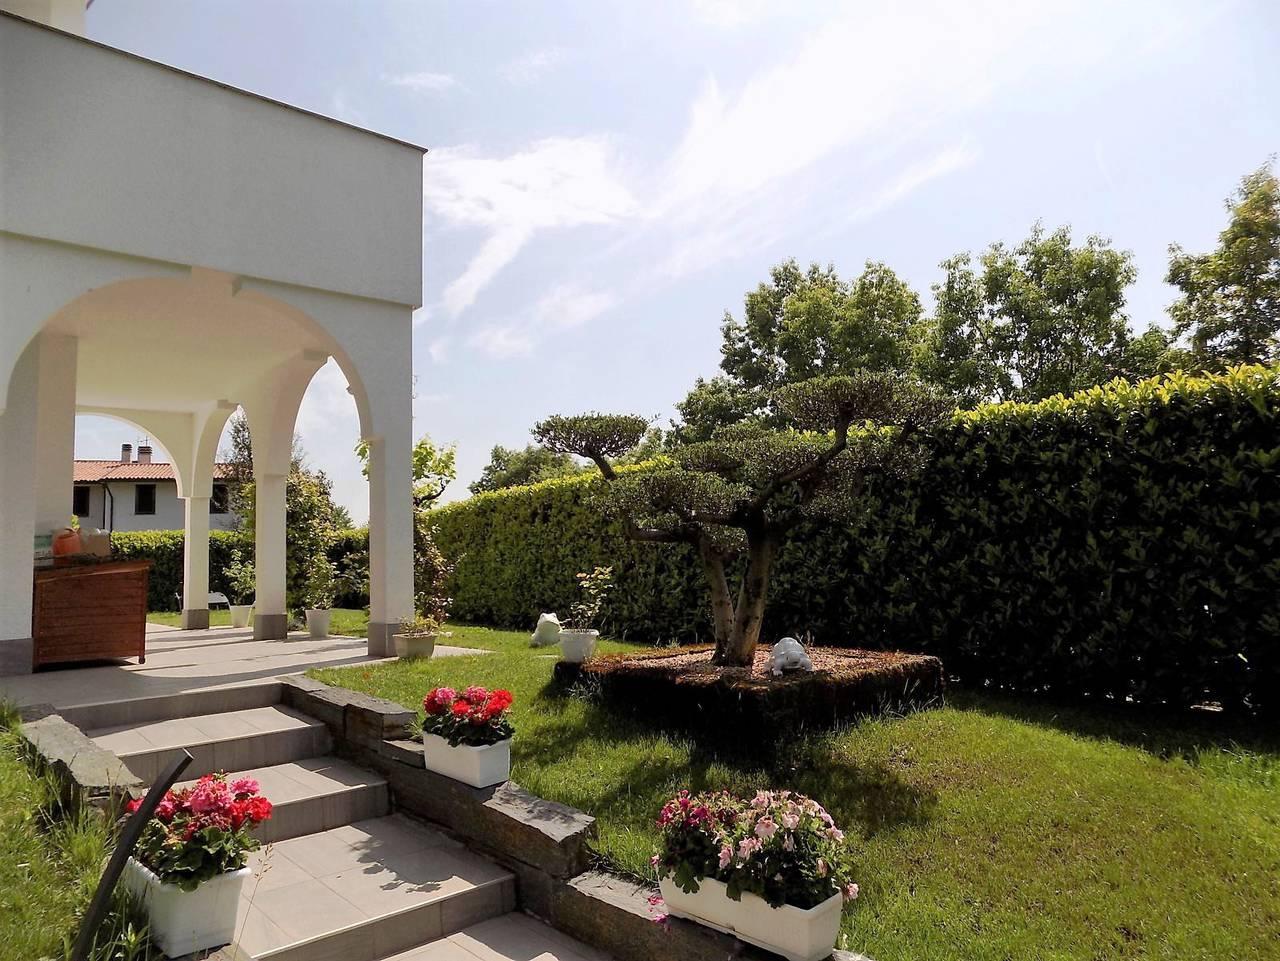 Porzione-villa-bifamigliare-ristrutturata-in-vendita-a-Carnate-4